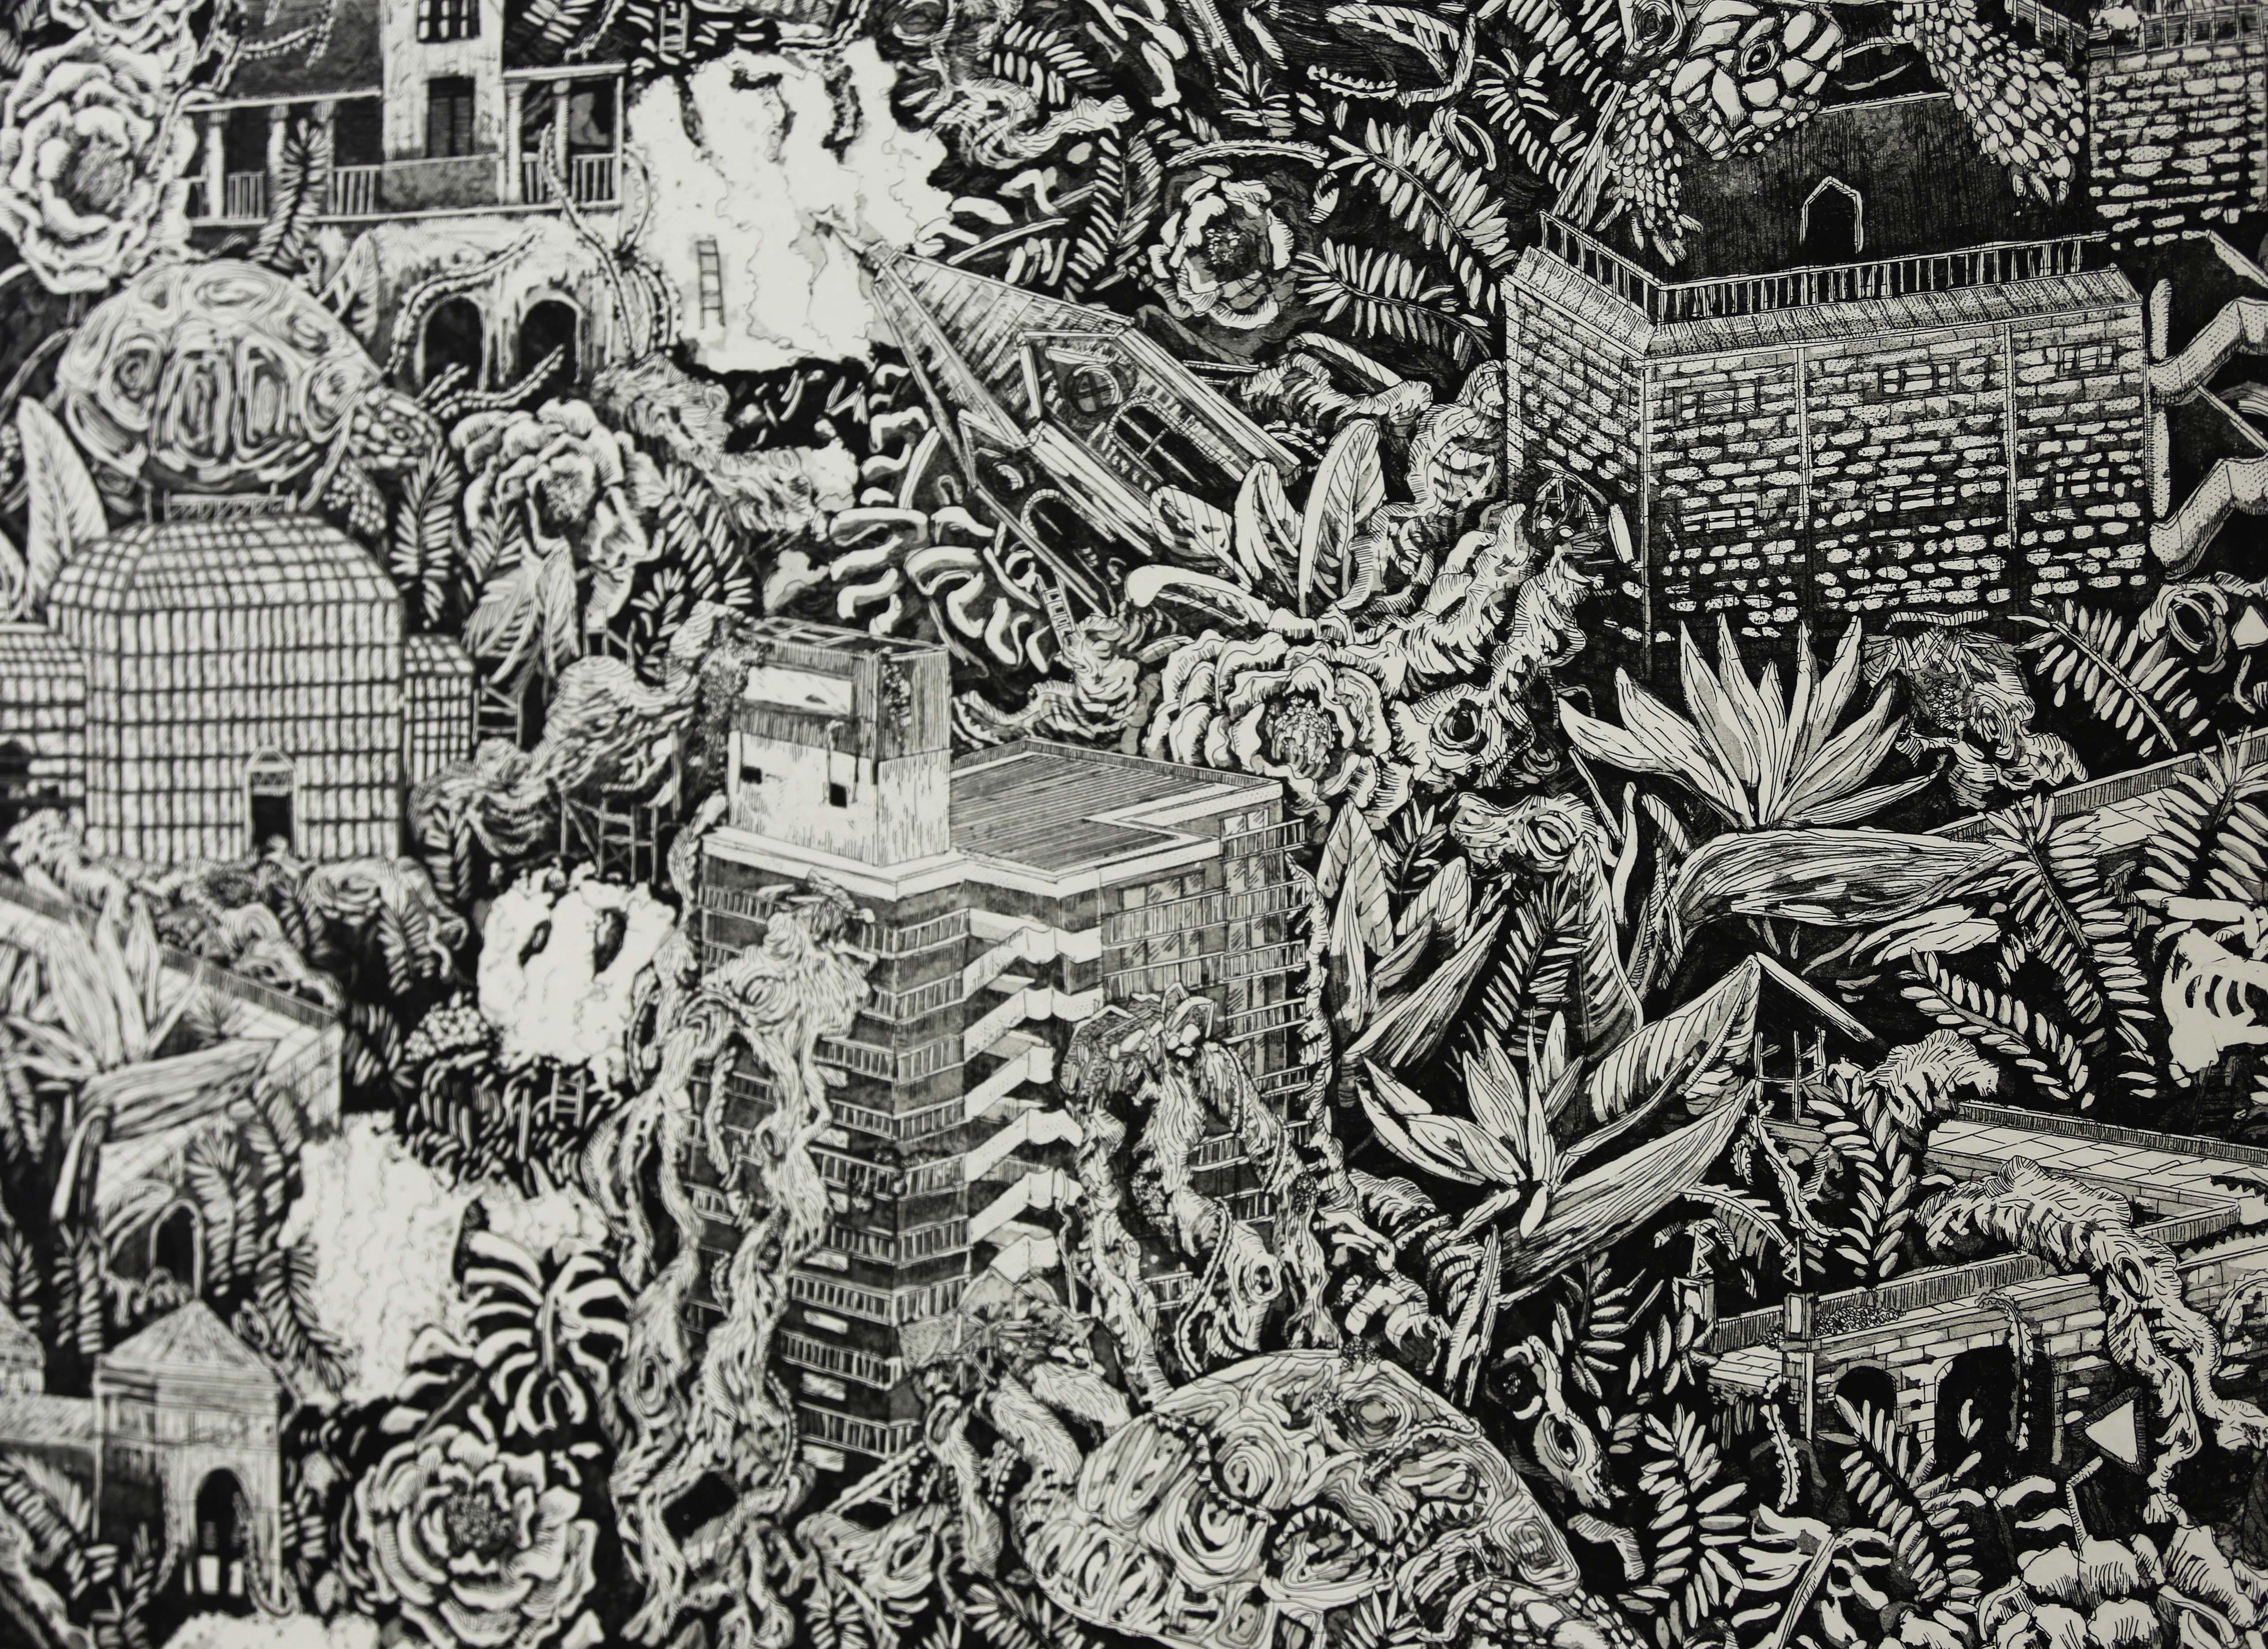 Untitled, 2017, 70cm x 70cm